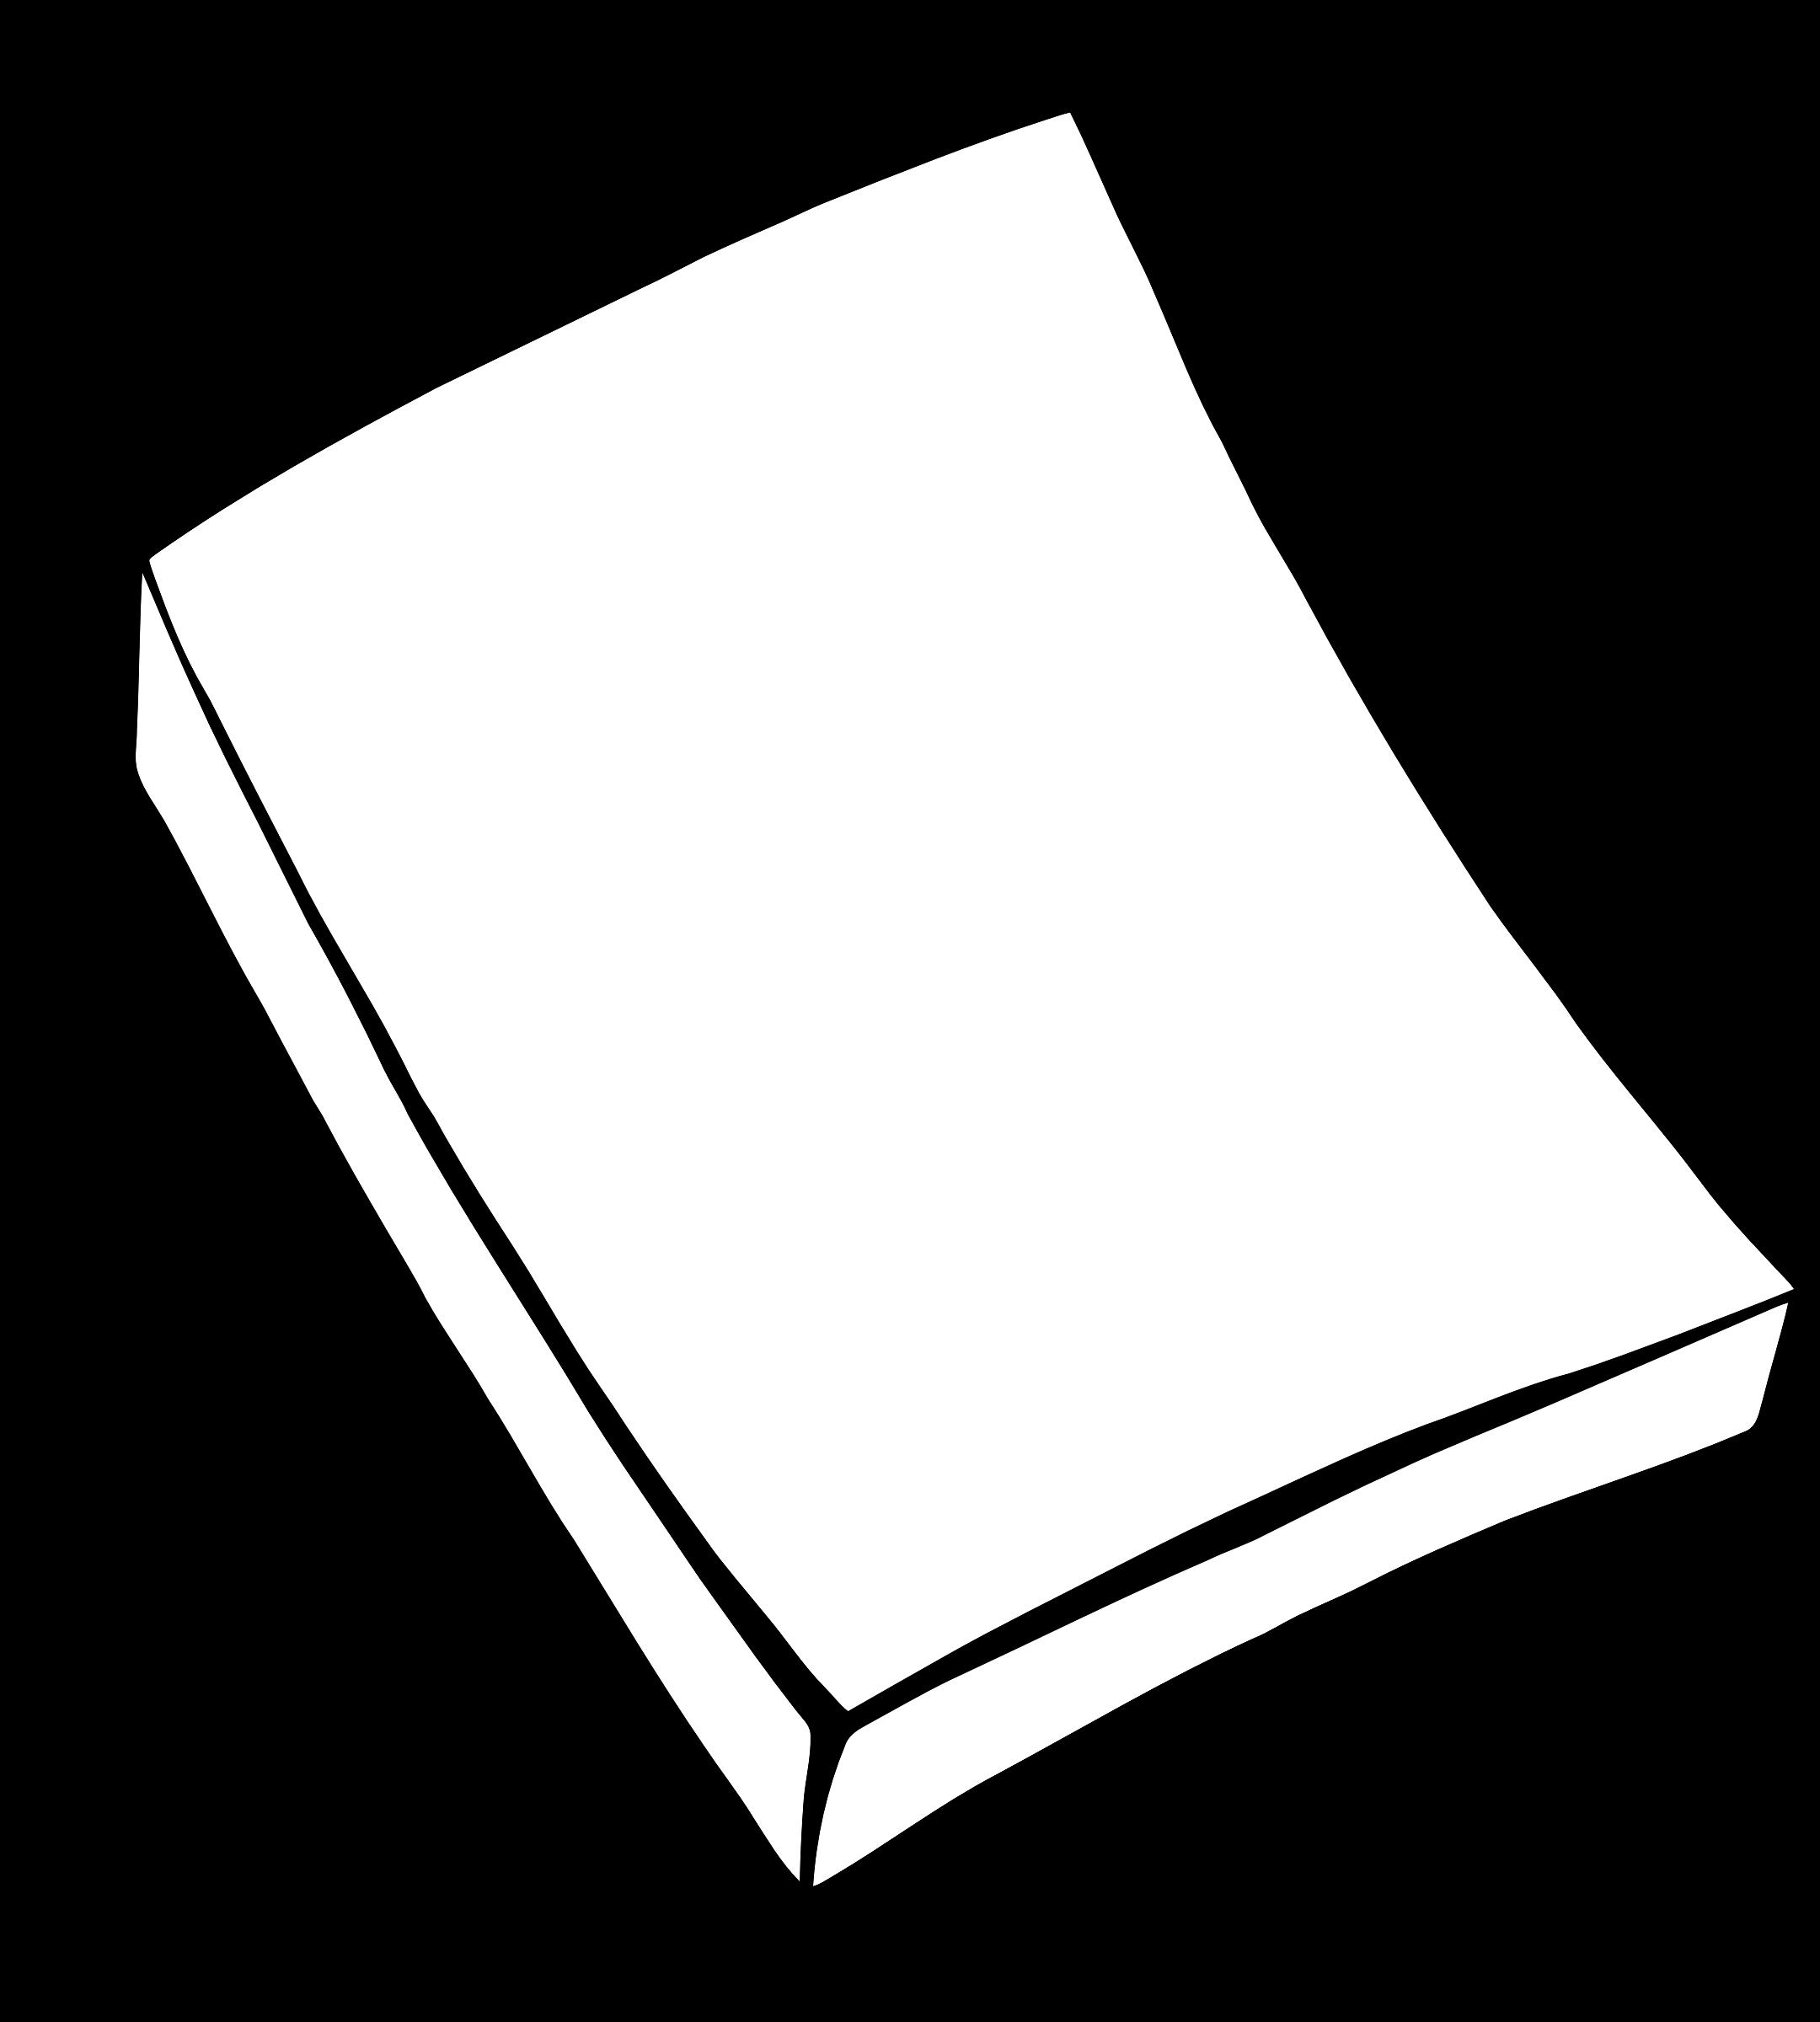 Paper clipart black and white. Memo pad big image